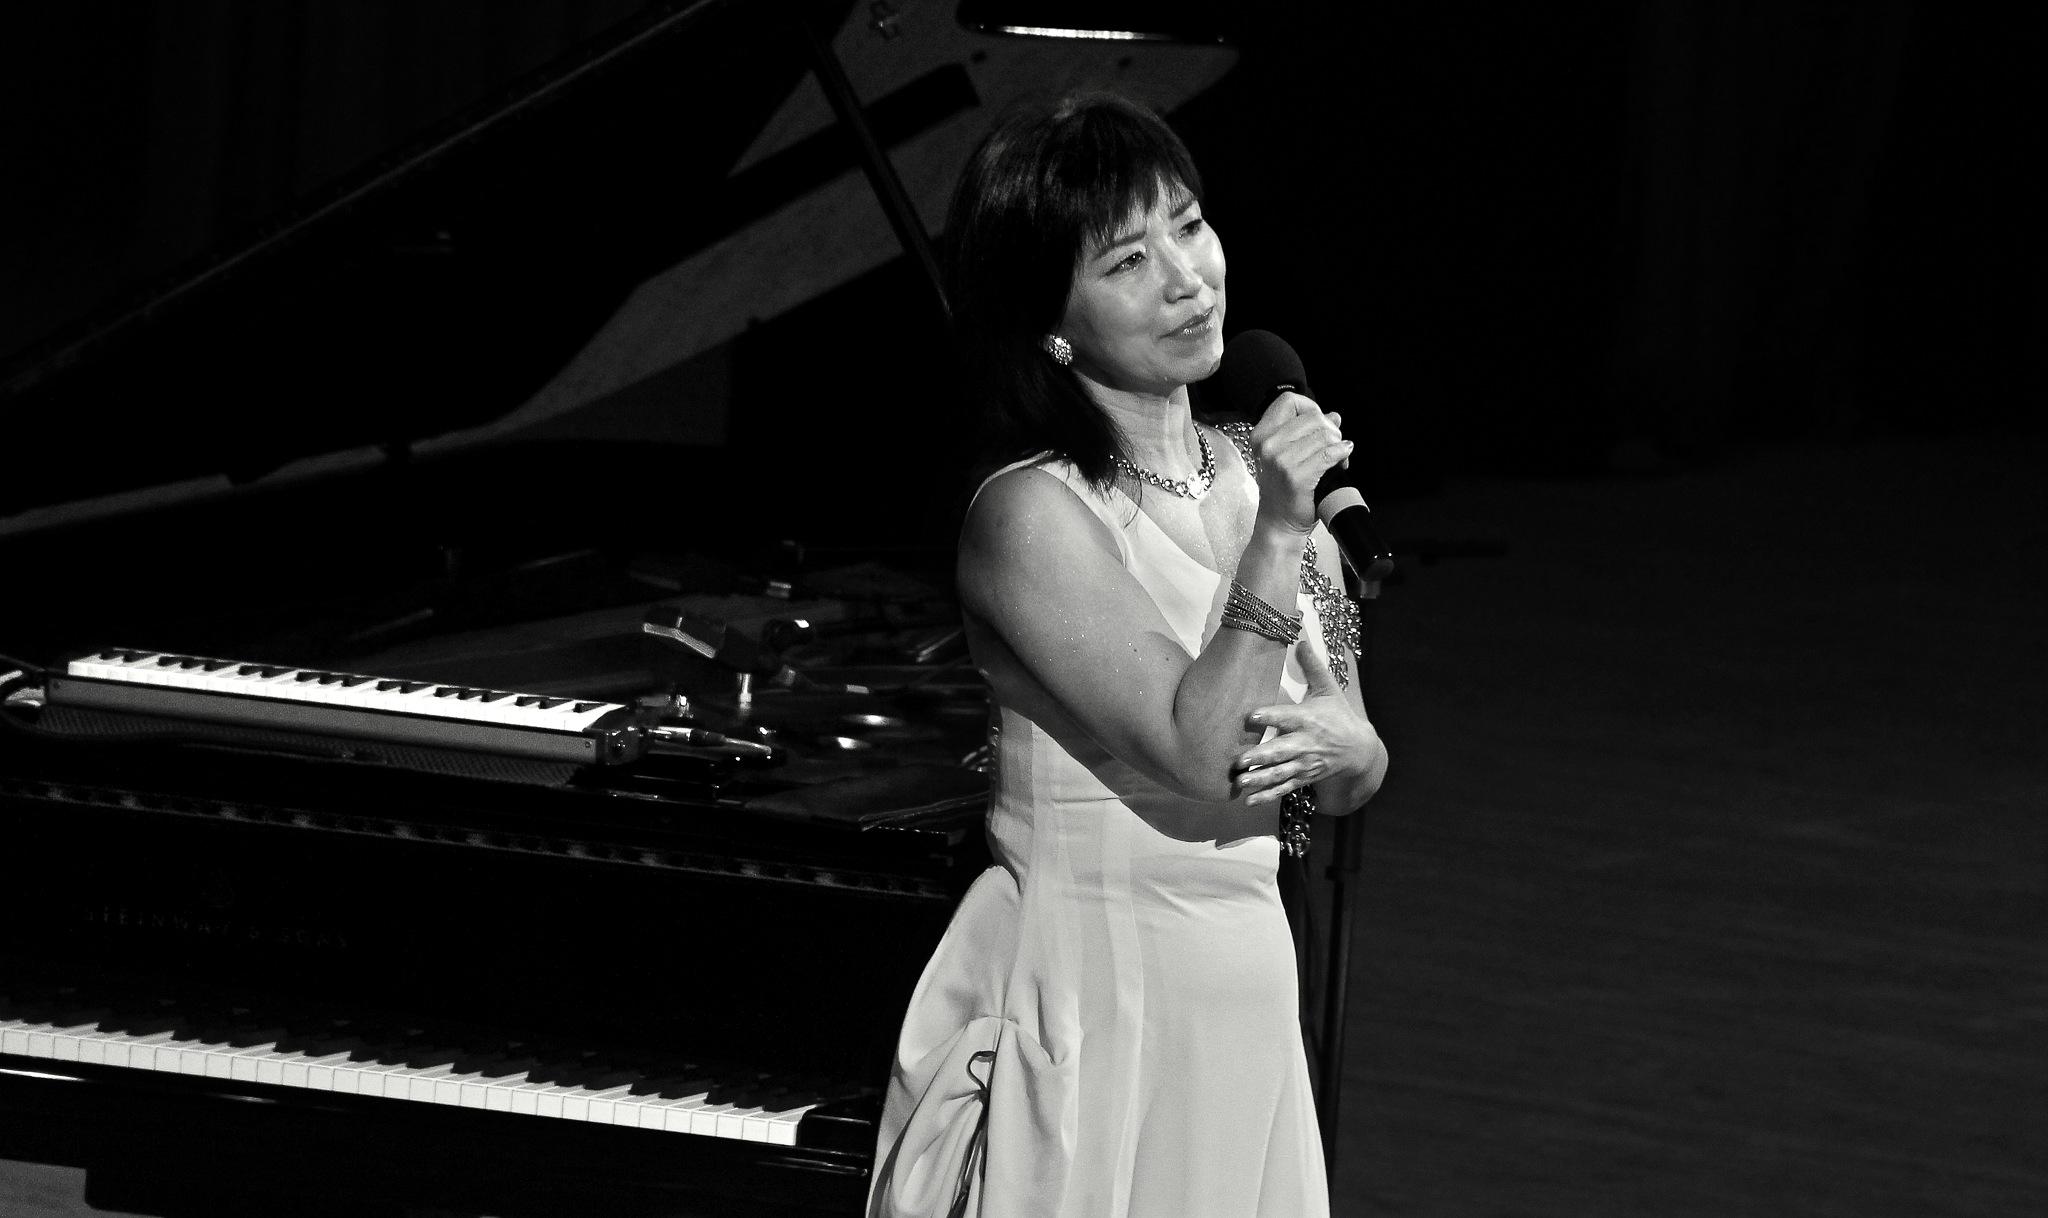 Pianist Keiko Matsui by Сергей Юрьев